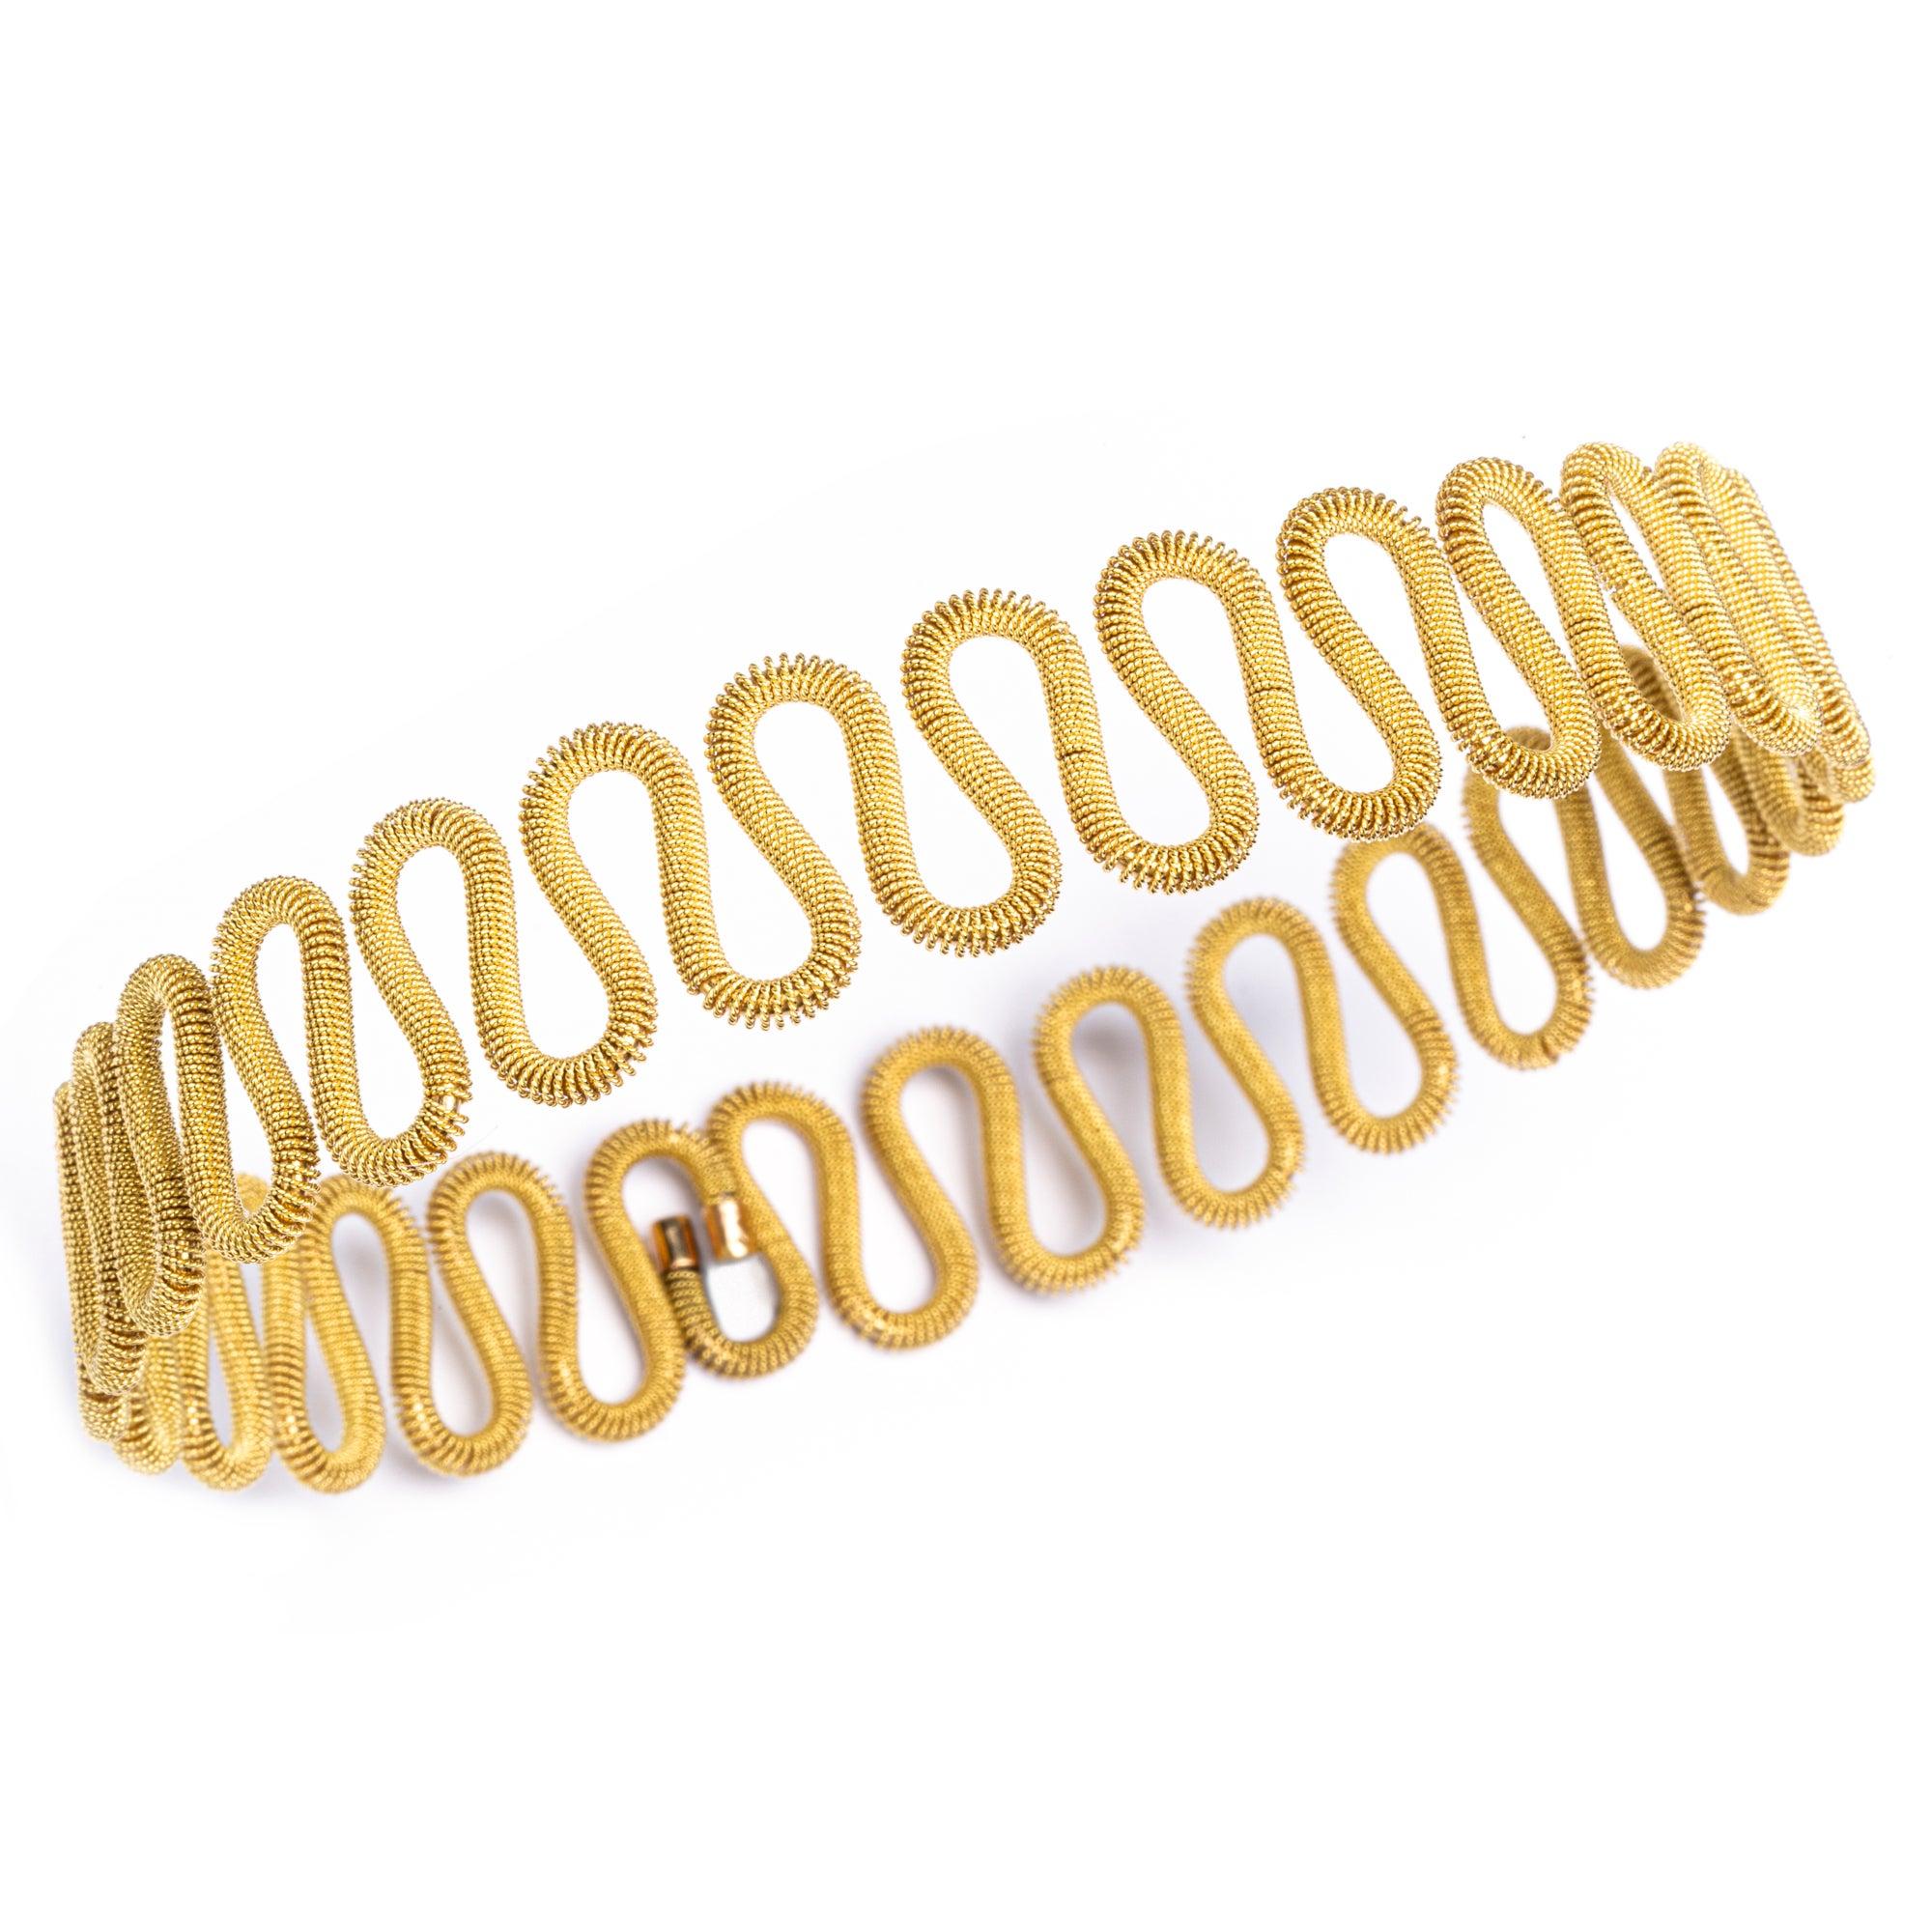 Alex Jona 18k Yellow Gold Twisted Wire Flexible Choker Necklace